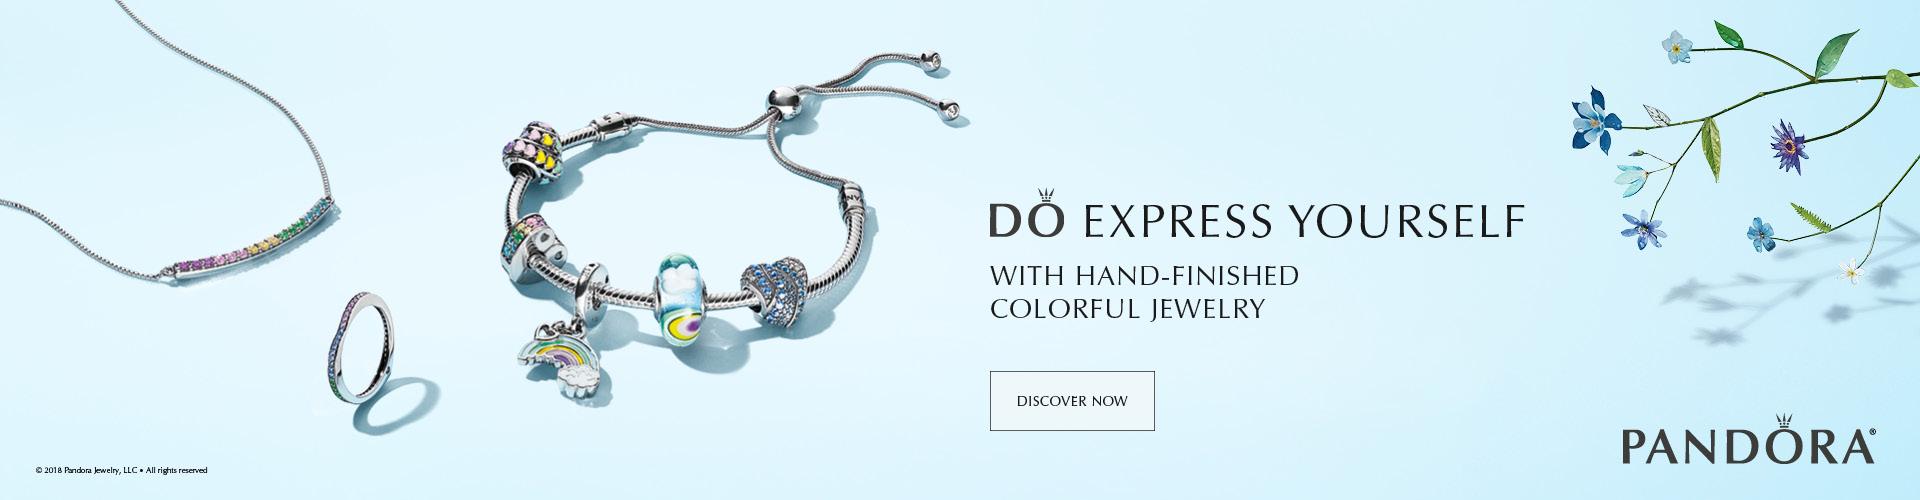 Pandora Do Express Yourself